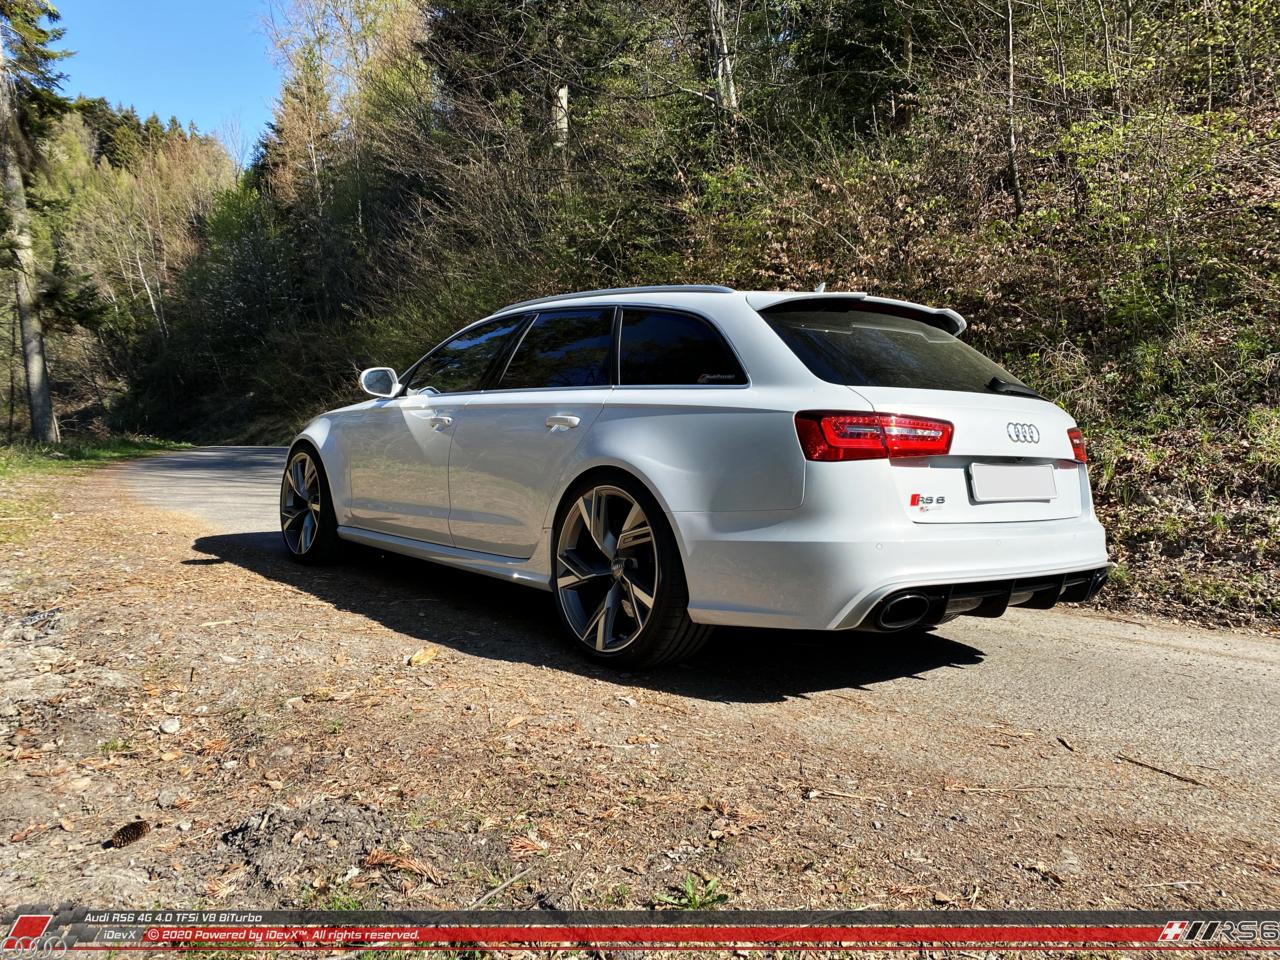 11.04.2020_Audi-RS6_iDevX_002.png